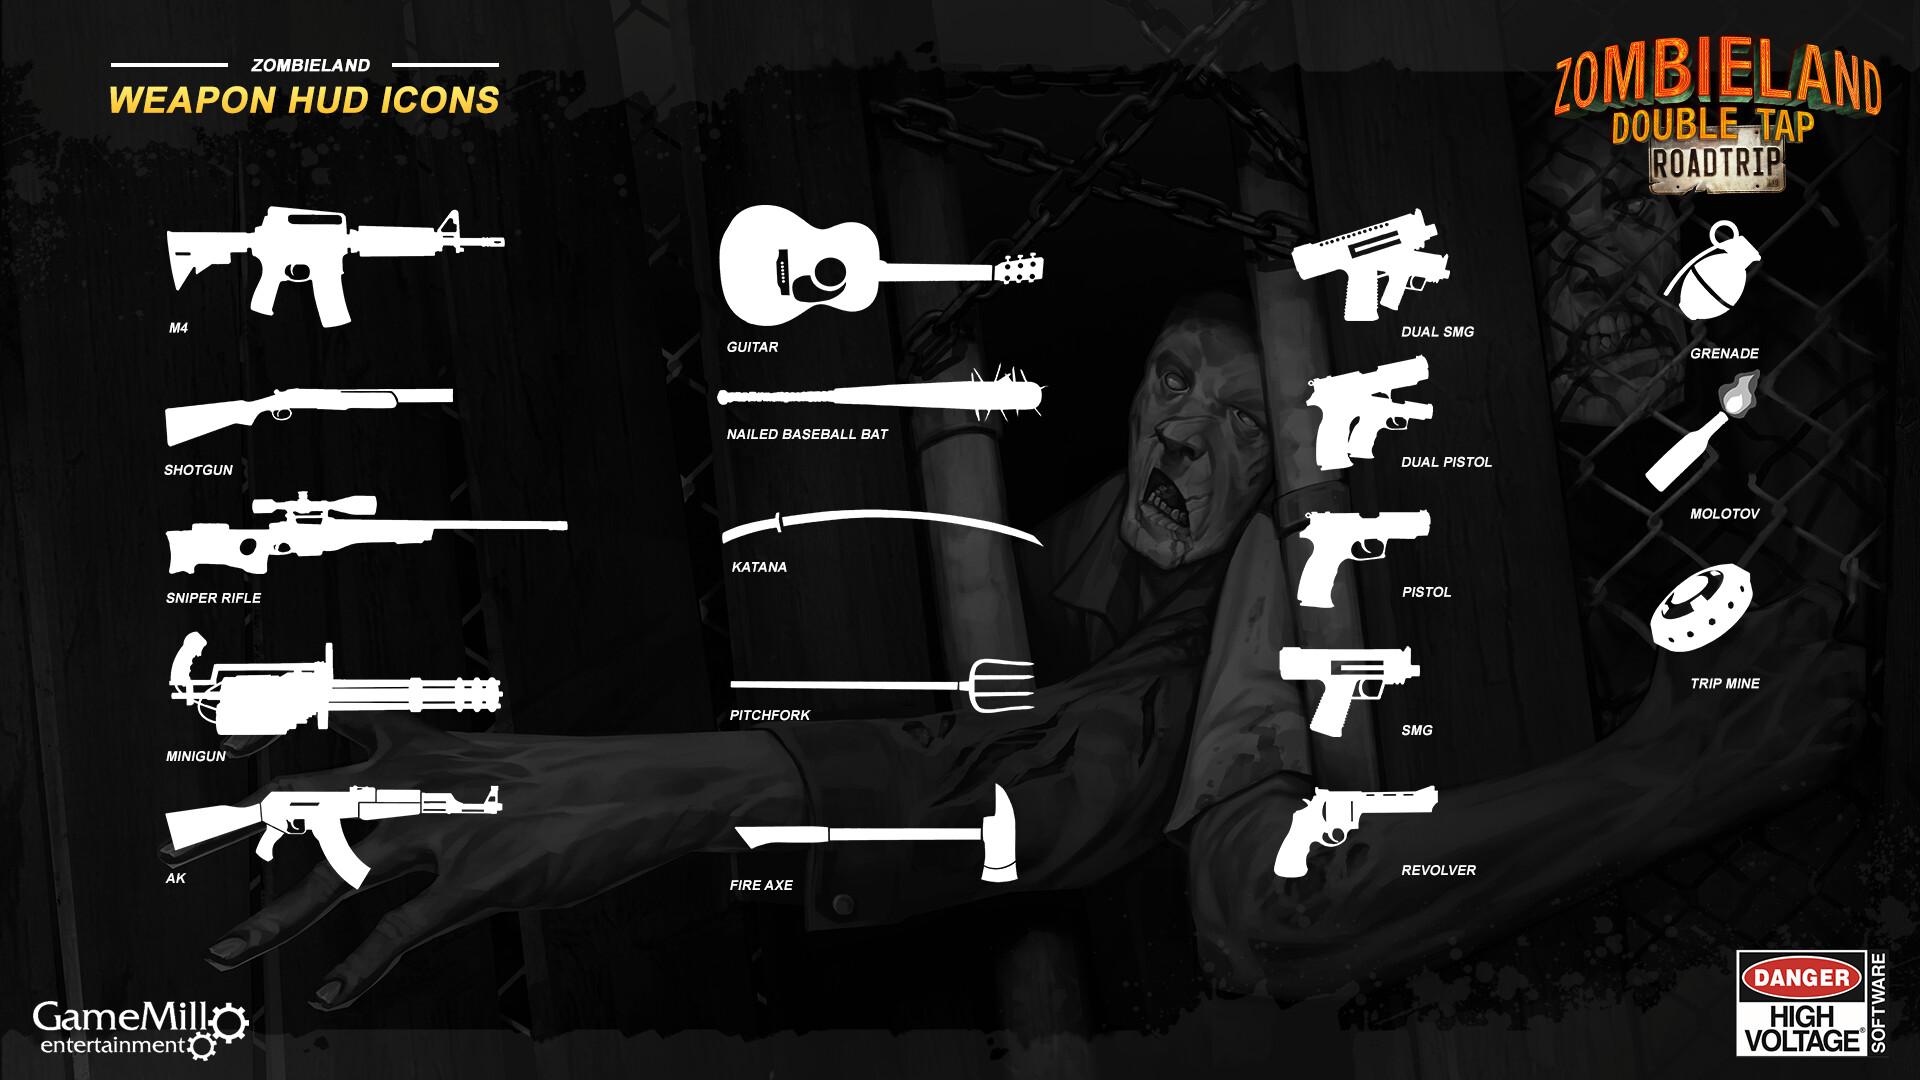 ben-lisle-weaponhudicons